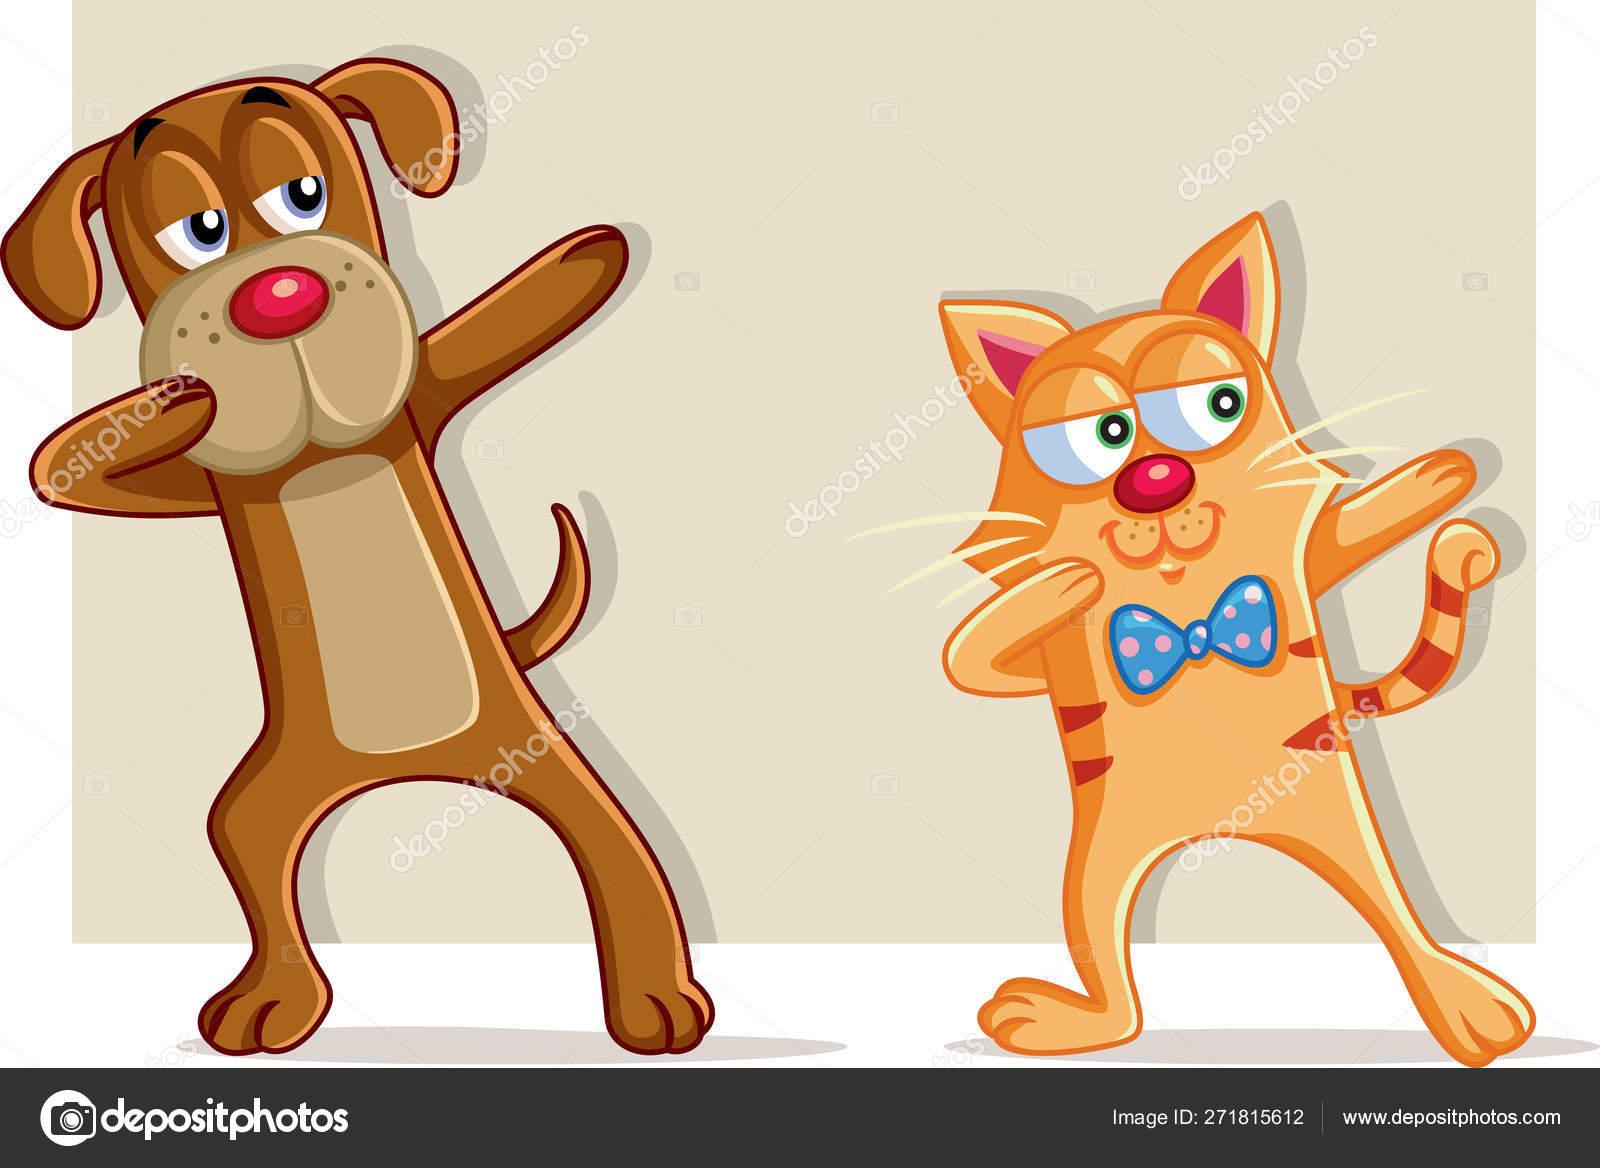 Funny Cat Dog Dabbing Cartoon Vector Stock Vector C Nicoletaionescu 271815612